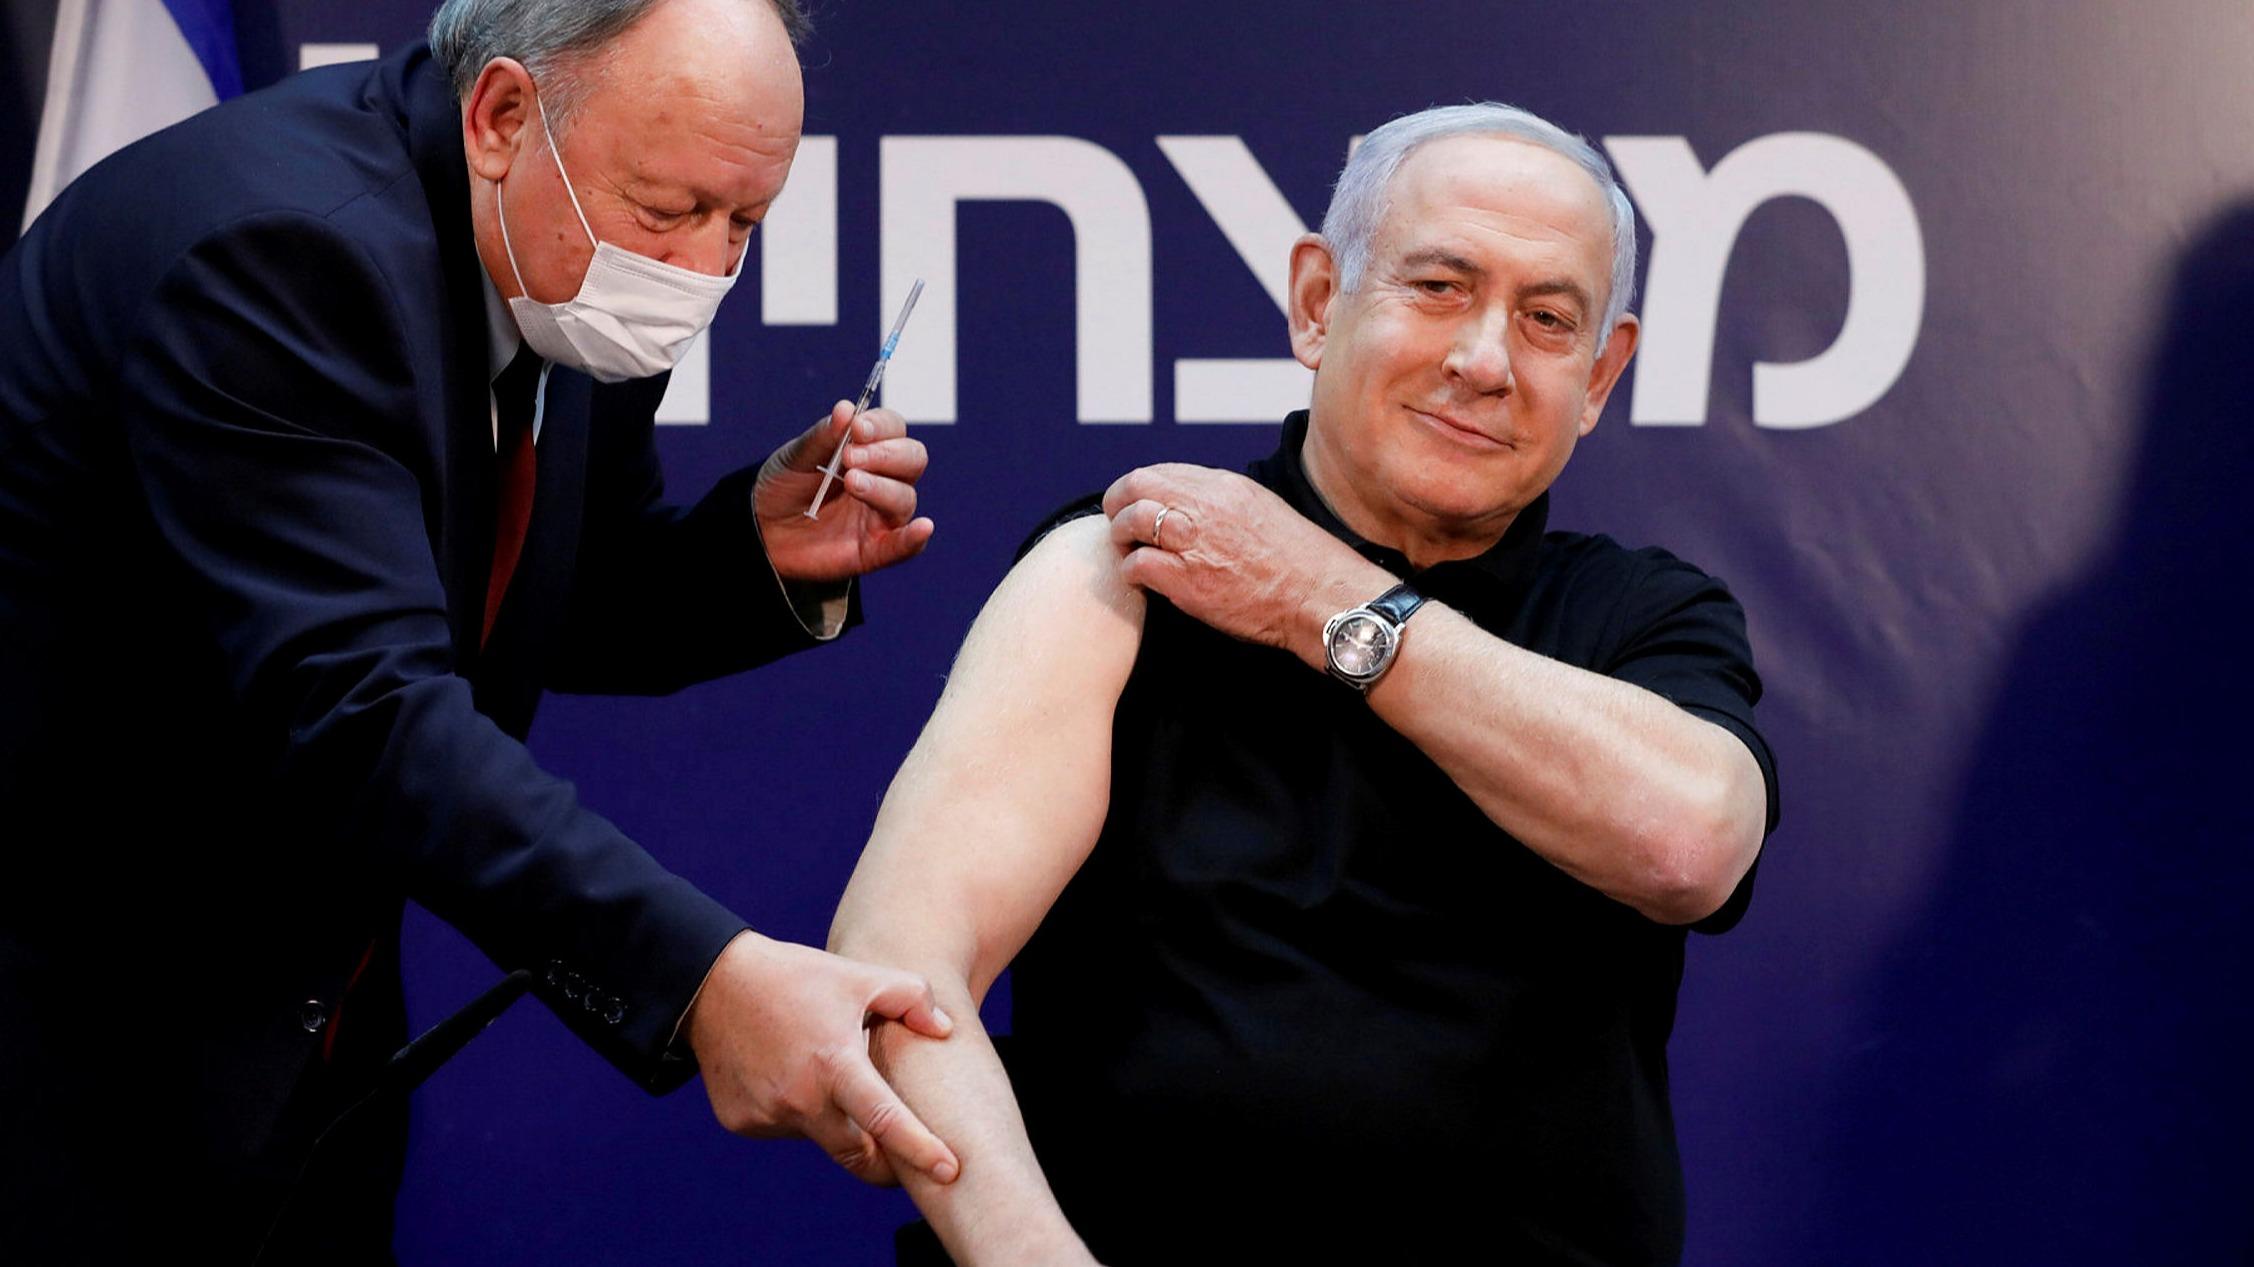 Netanyahu's corona jab sets off race to next Israel election | Financial  Times